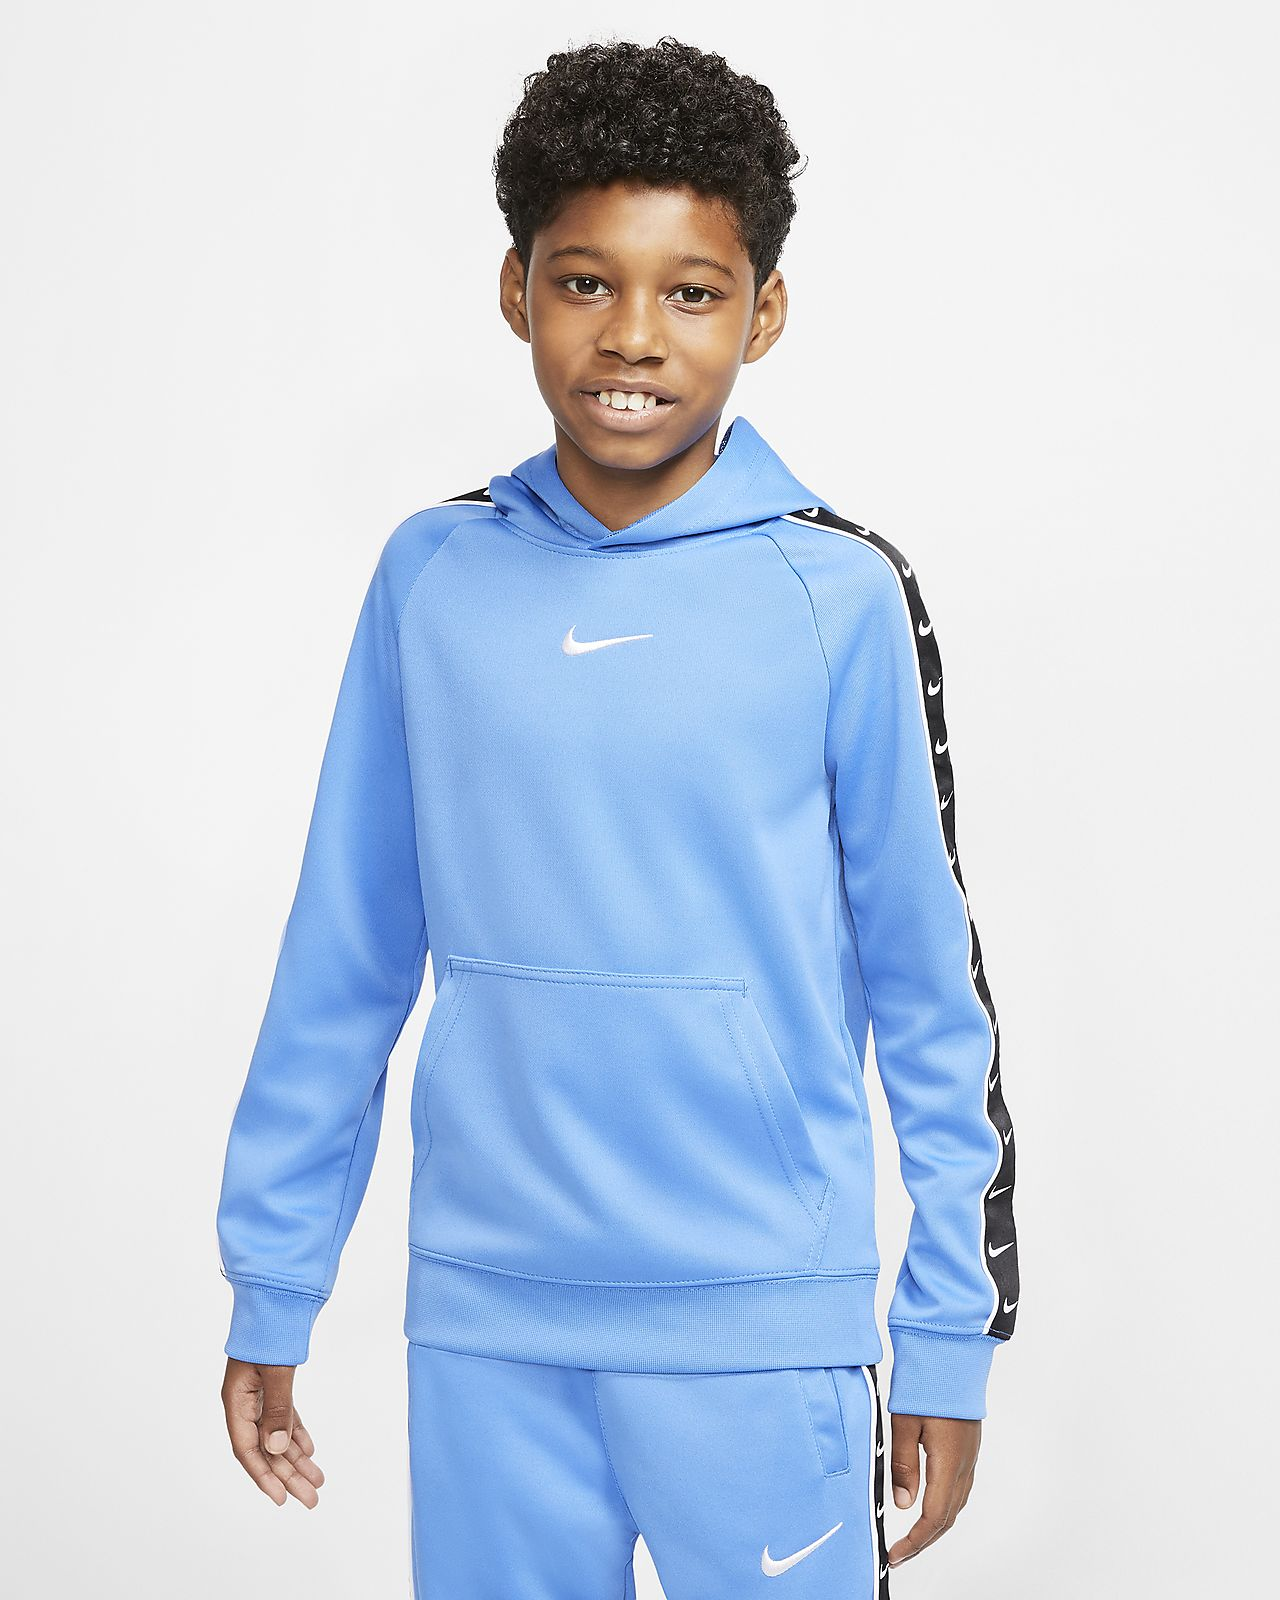 Hoodie Nike Sportswear Swoosh Júnior